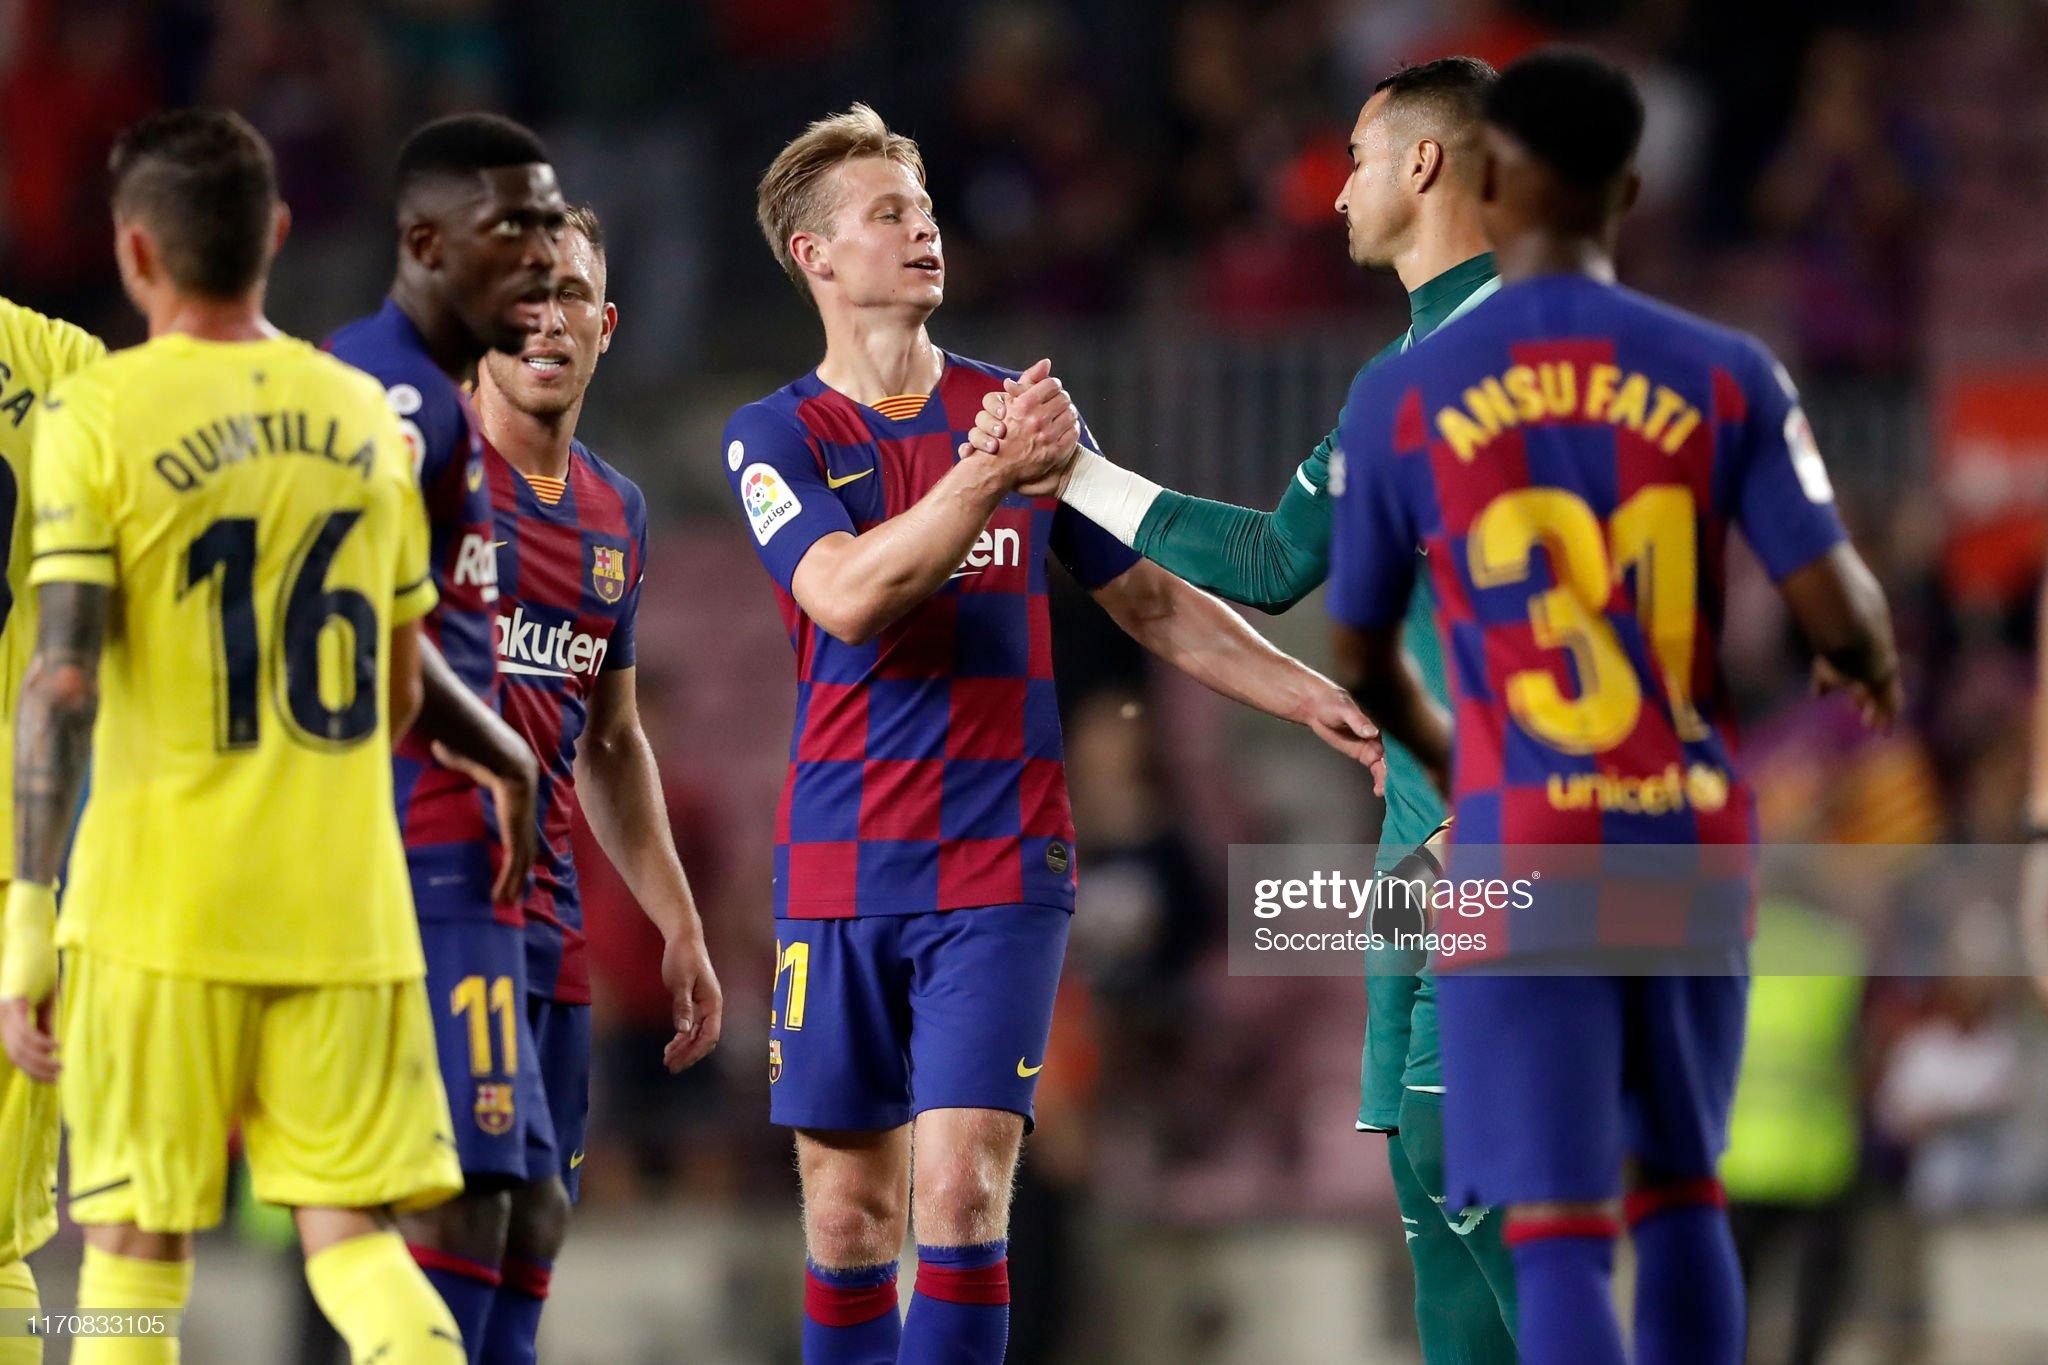 صور مباراة : برشلونة - فياريال 2-1 ( 24-09-2019 )  Frenkie-de-jong-of-fc-barcelona-celebrates-the-victory-during-the-la-picture-id1170833105?s=2048x2048